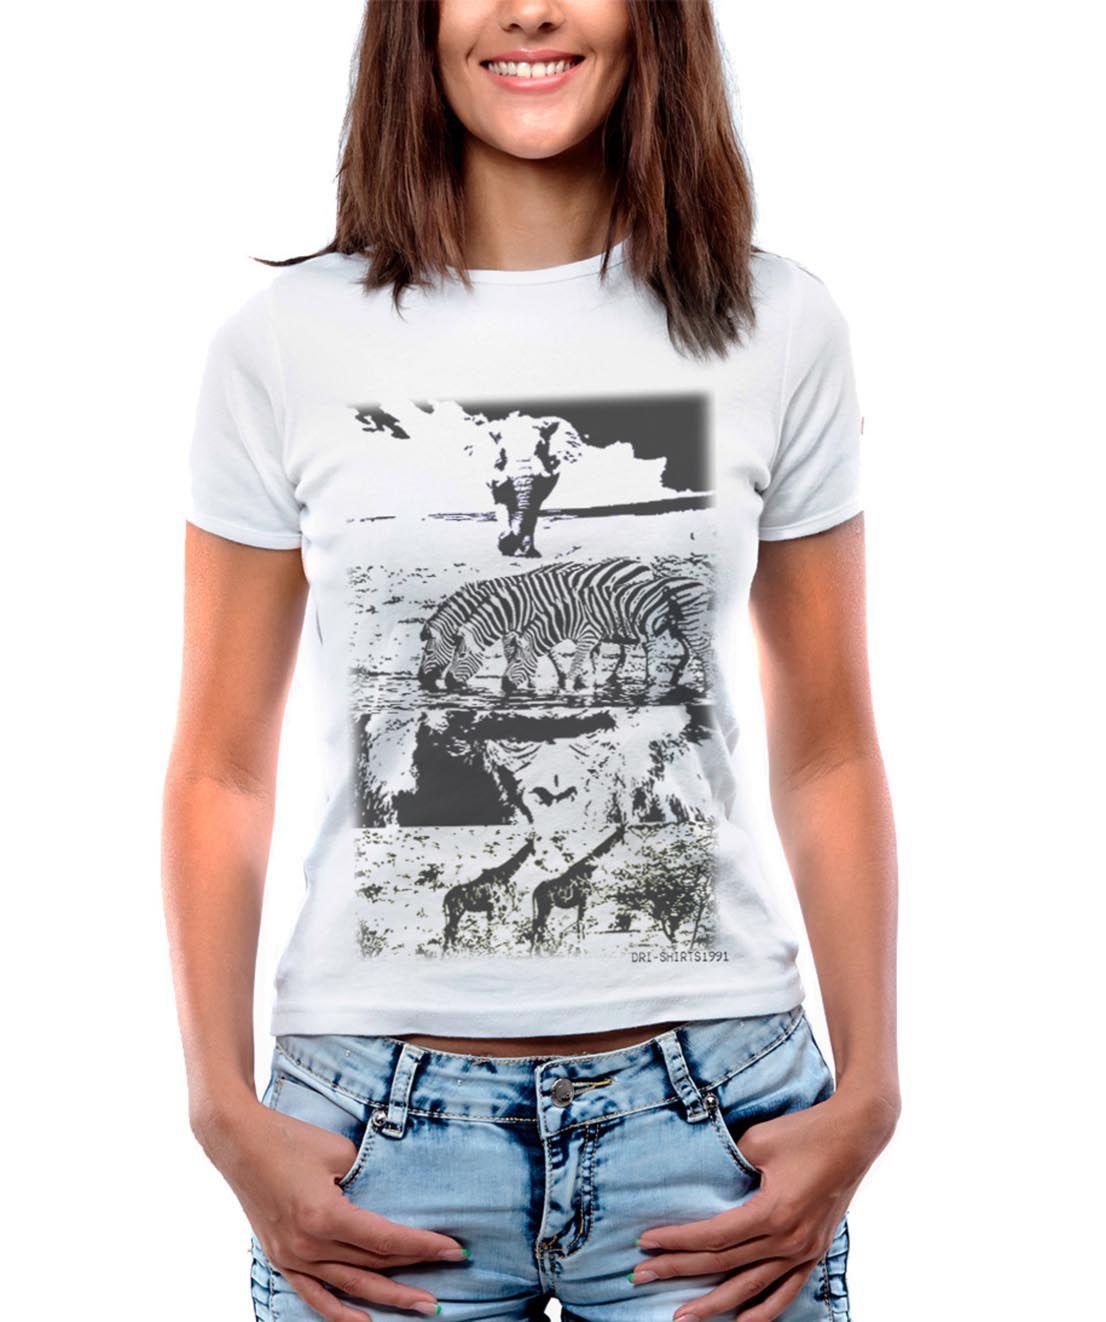 Blusa OutletDri T-Shirt Estampada Elefante Zebra Gorila e Girafas Branca